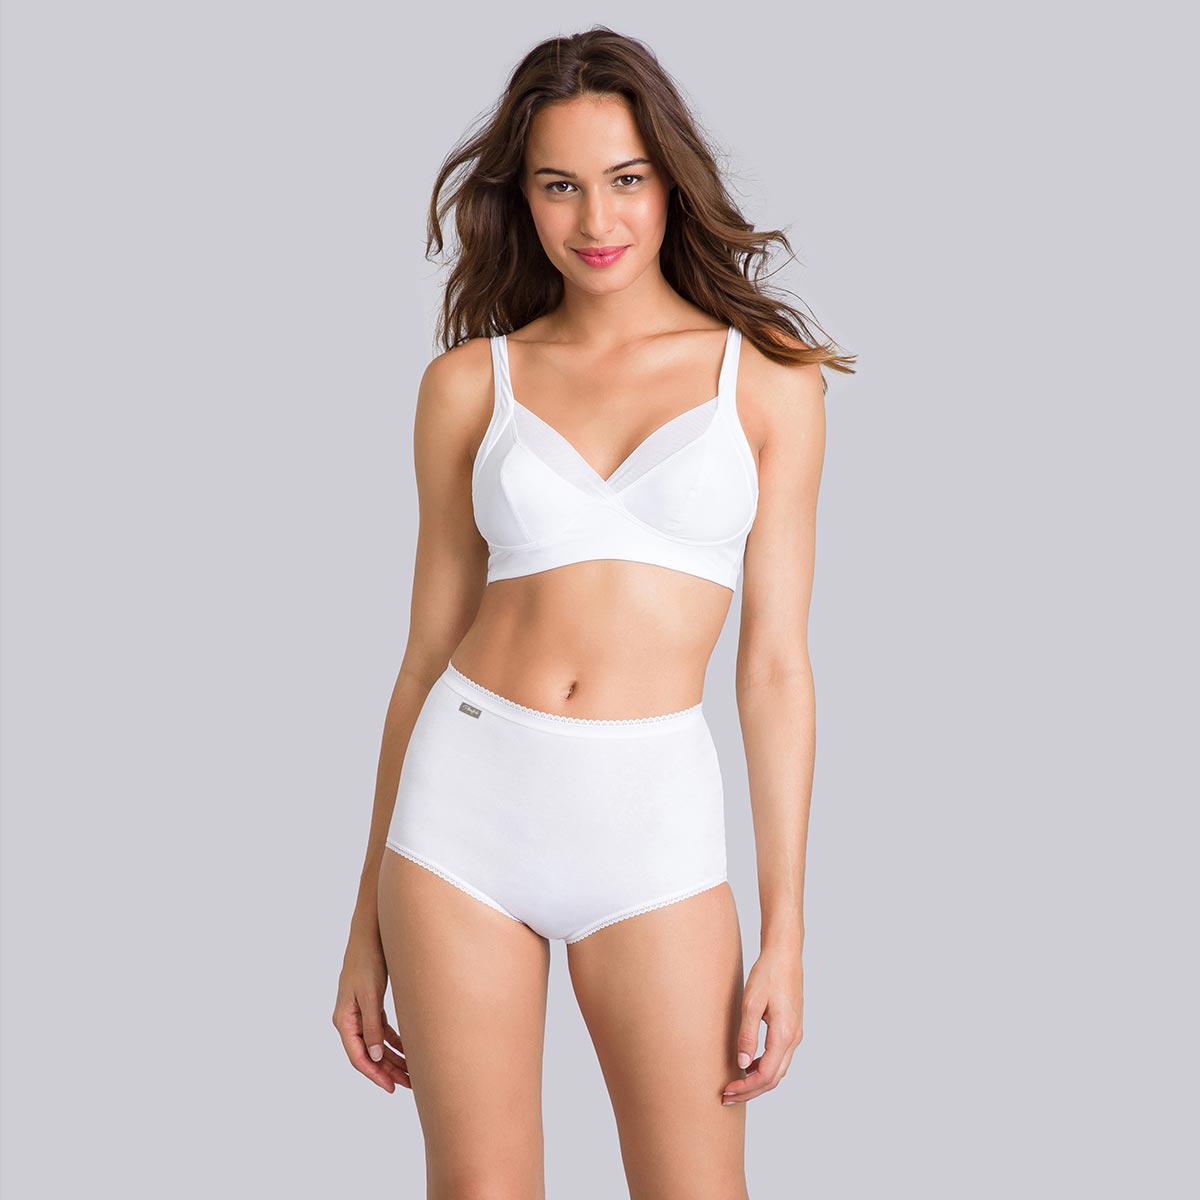 3 culottes Maxi blanche, grise et corail - Coton Stretch-PLAYTEX